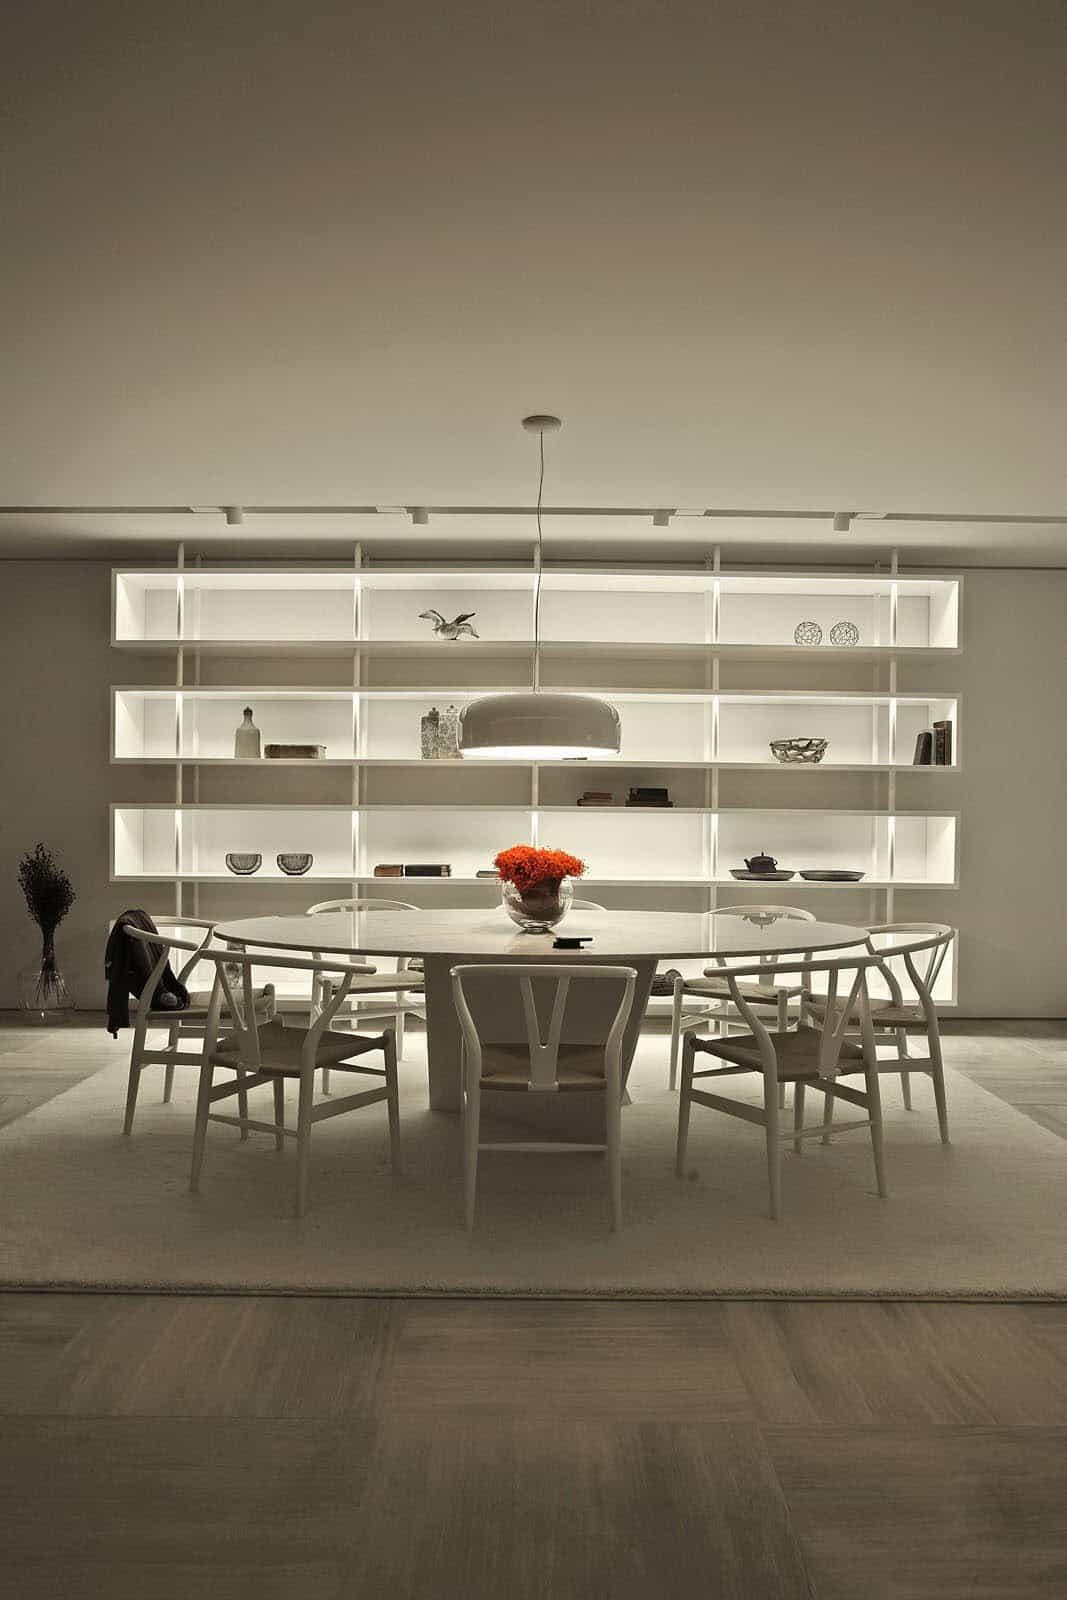 S house interior by tanju özelgin 20